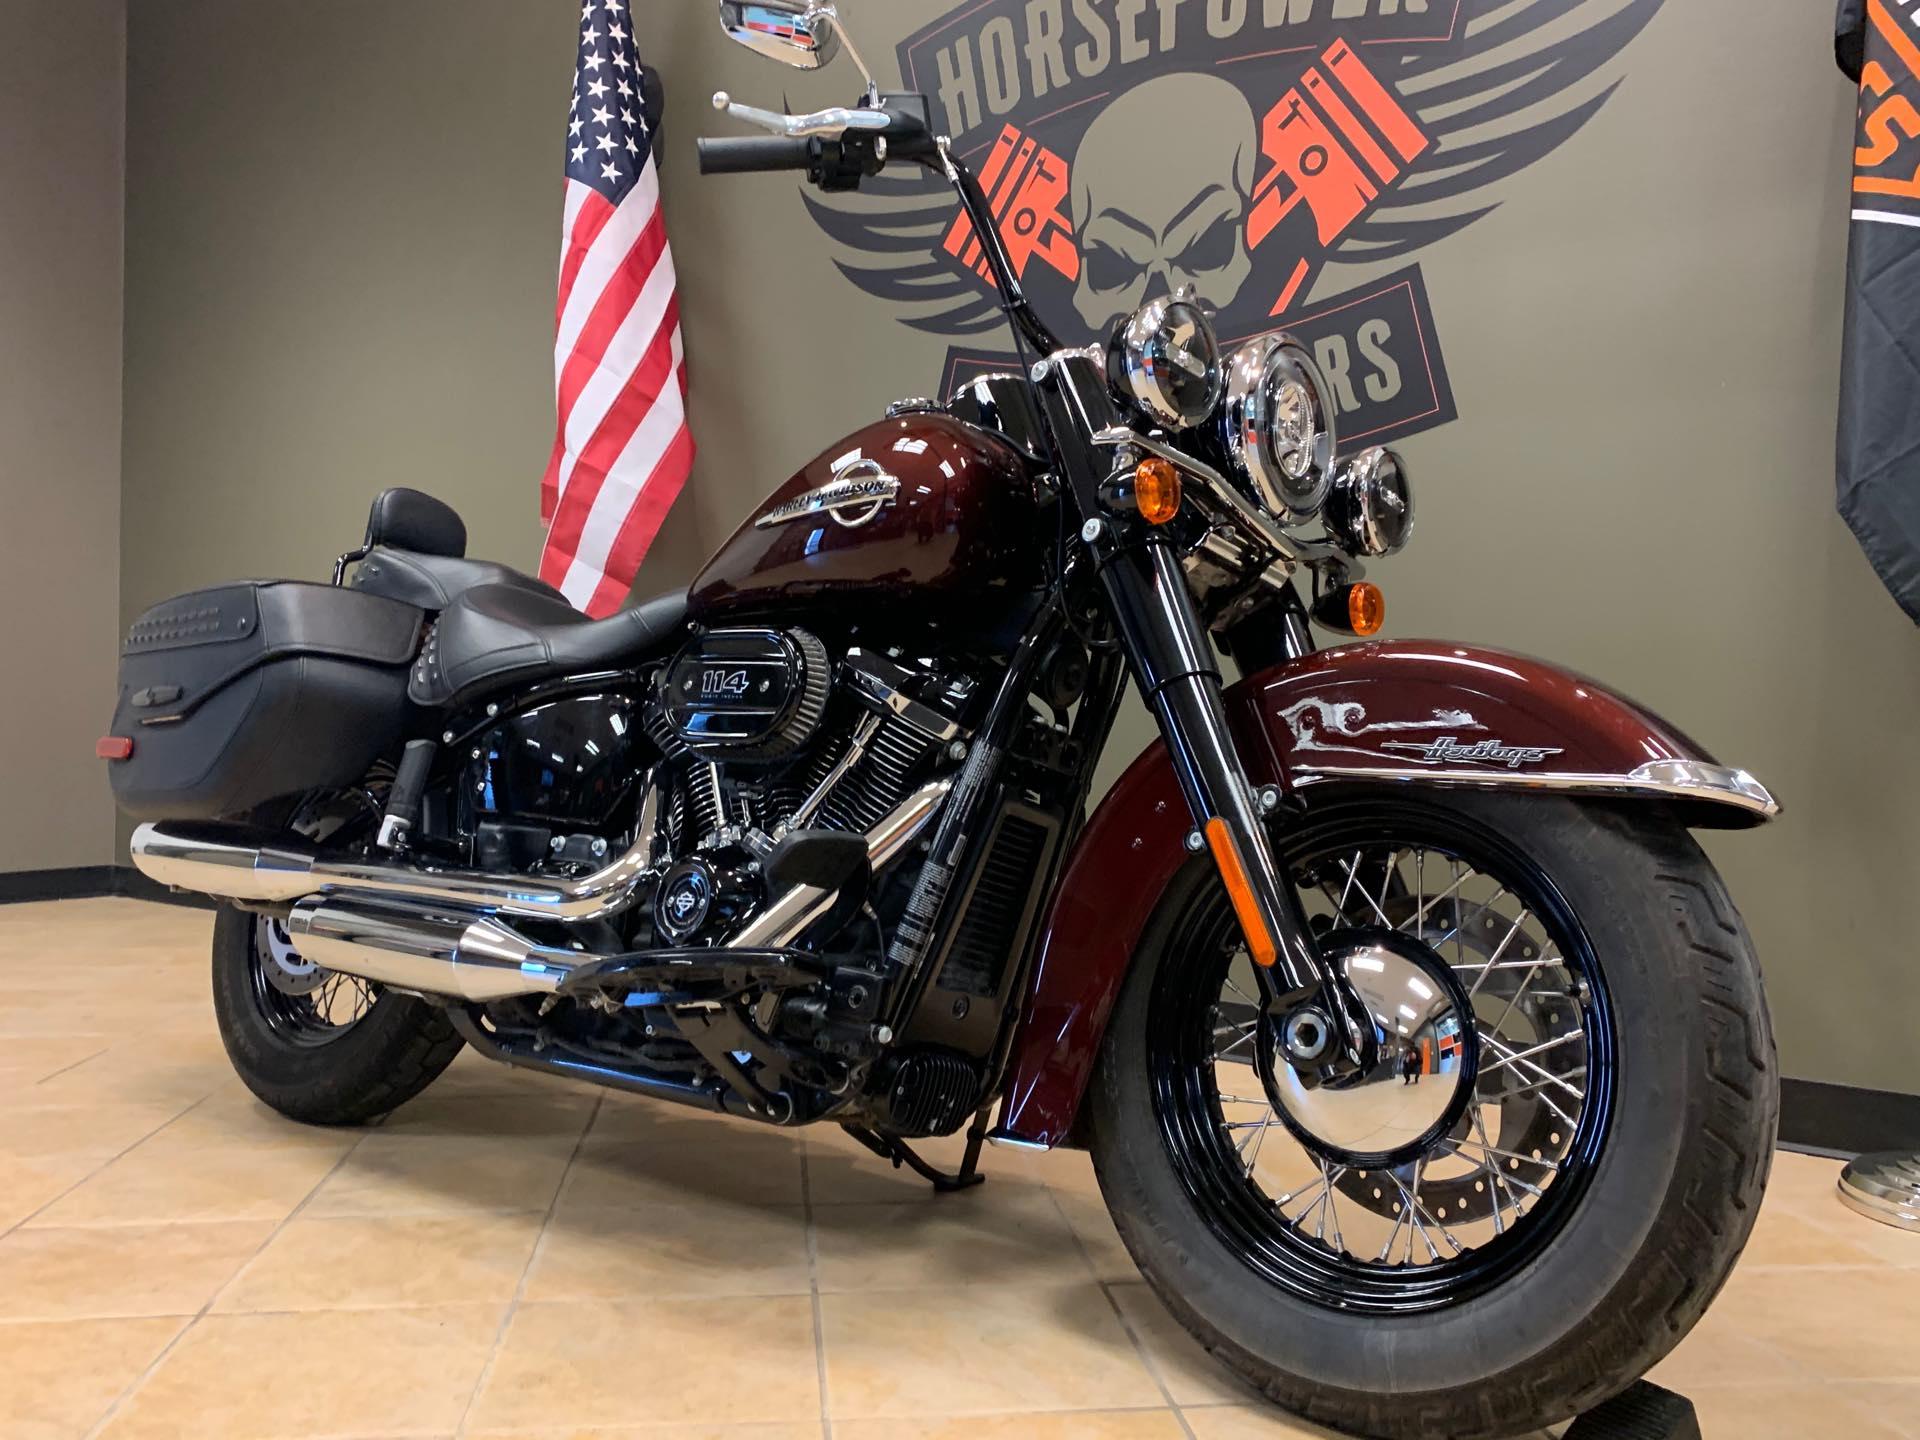 2018 Harley-Davidson Softail Heritage Classic 114 at Loess Hills Harley-Davidson